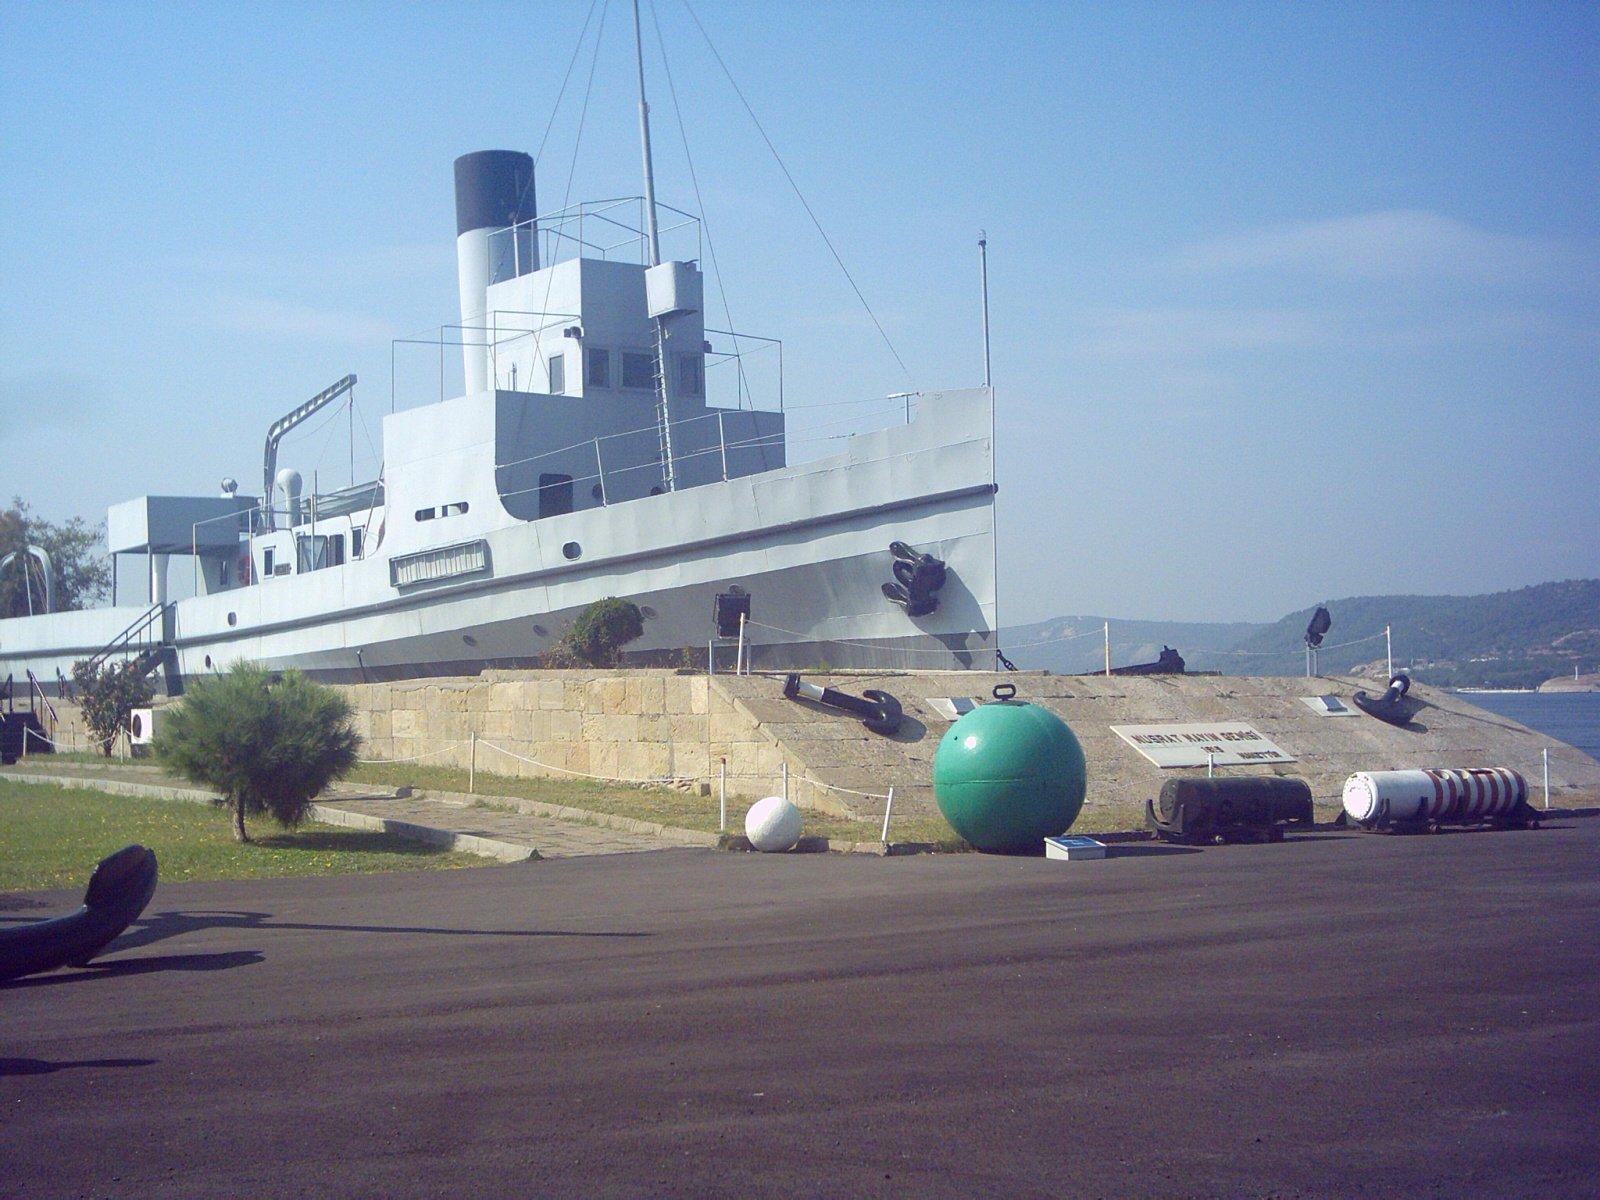 Canakkale Naval Museum - TripAdvisor